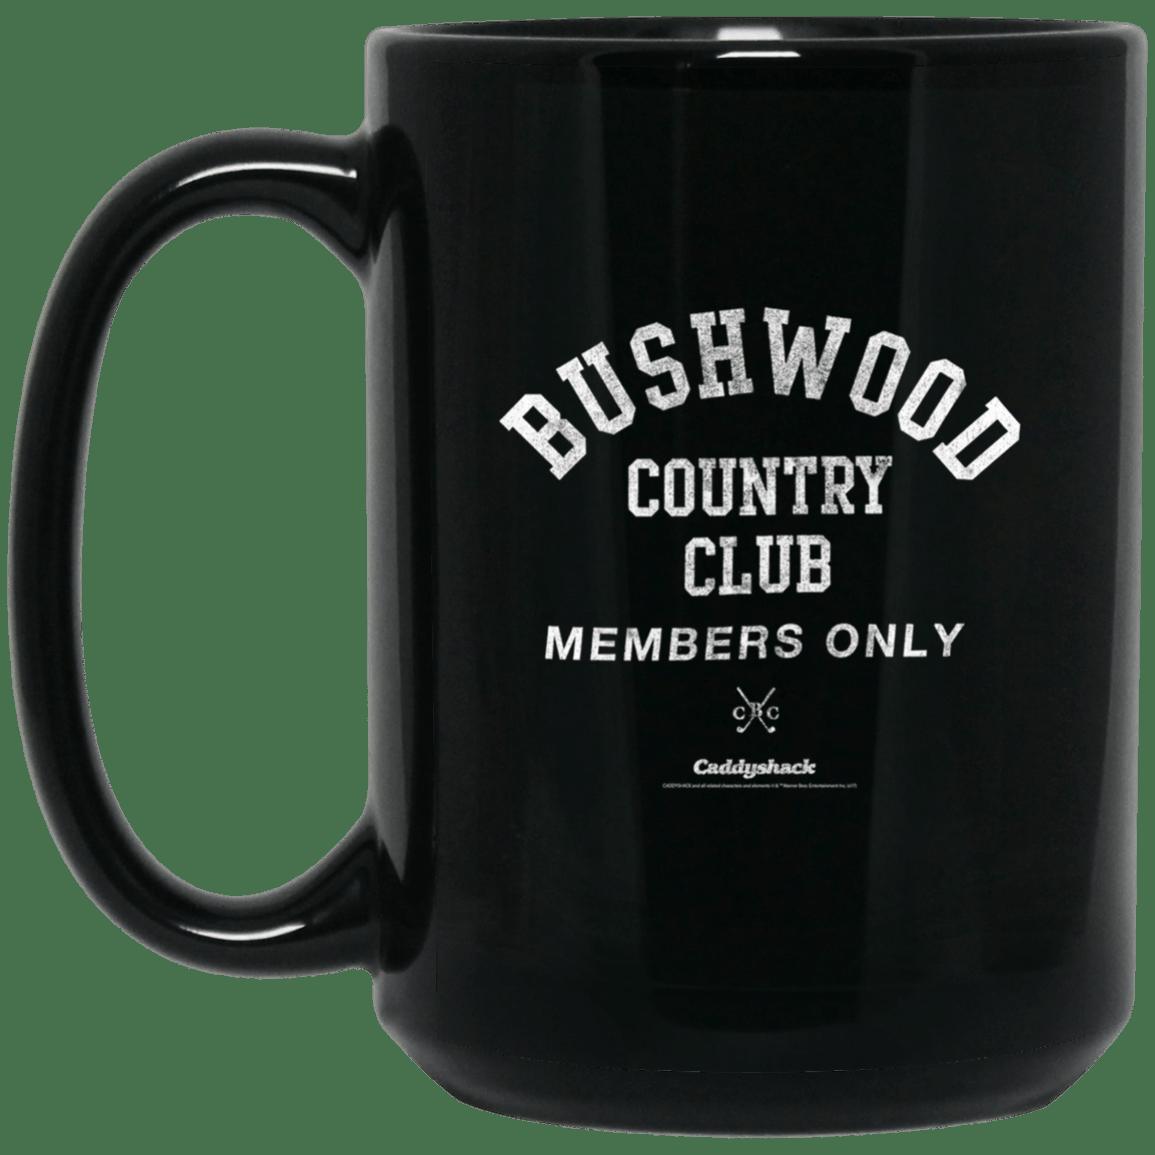 Caddyshack bushwood country club members only mug